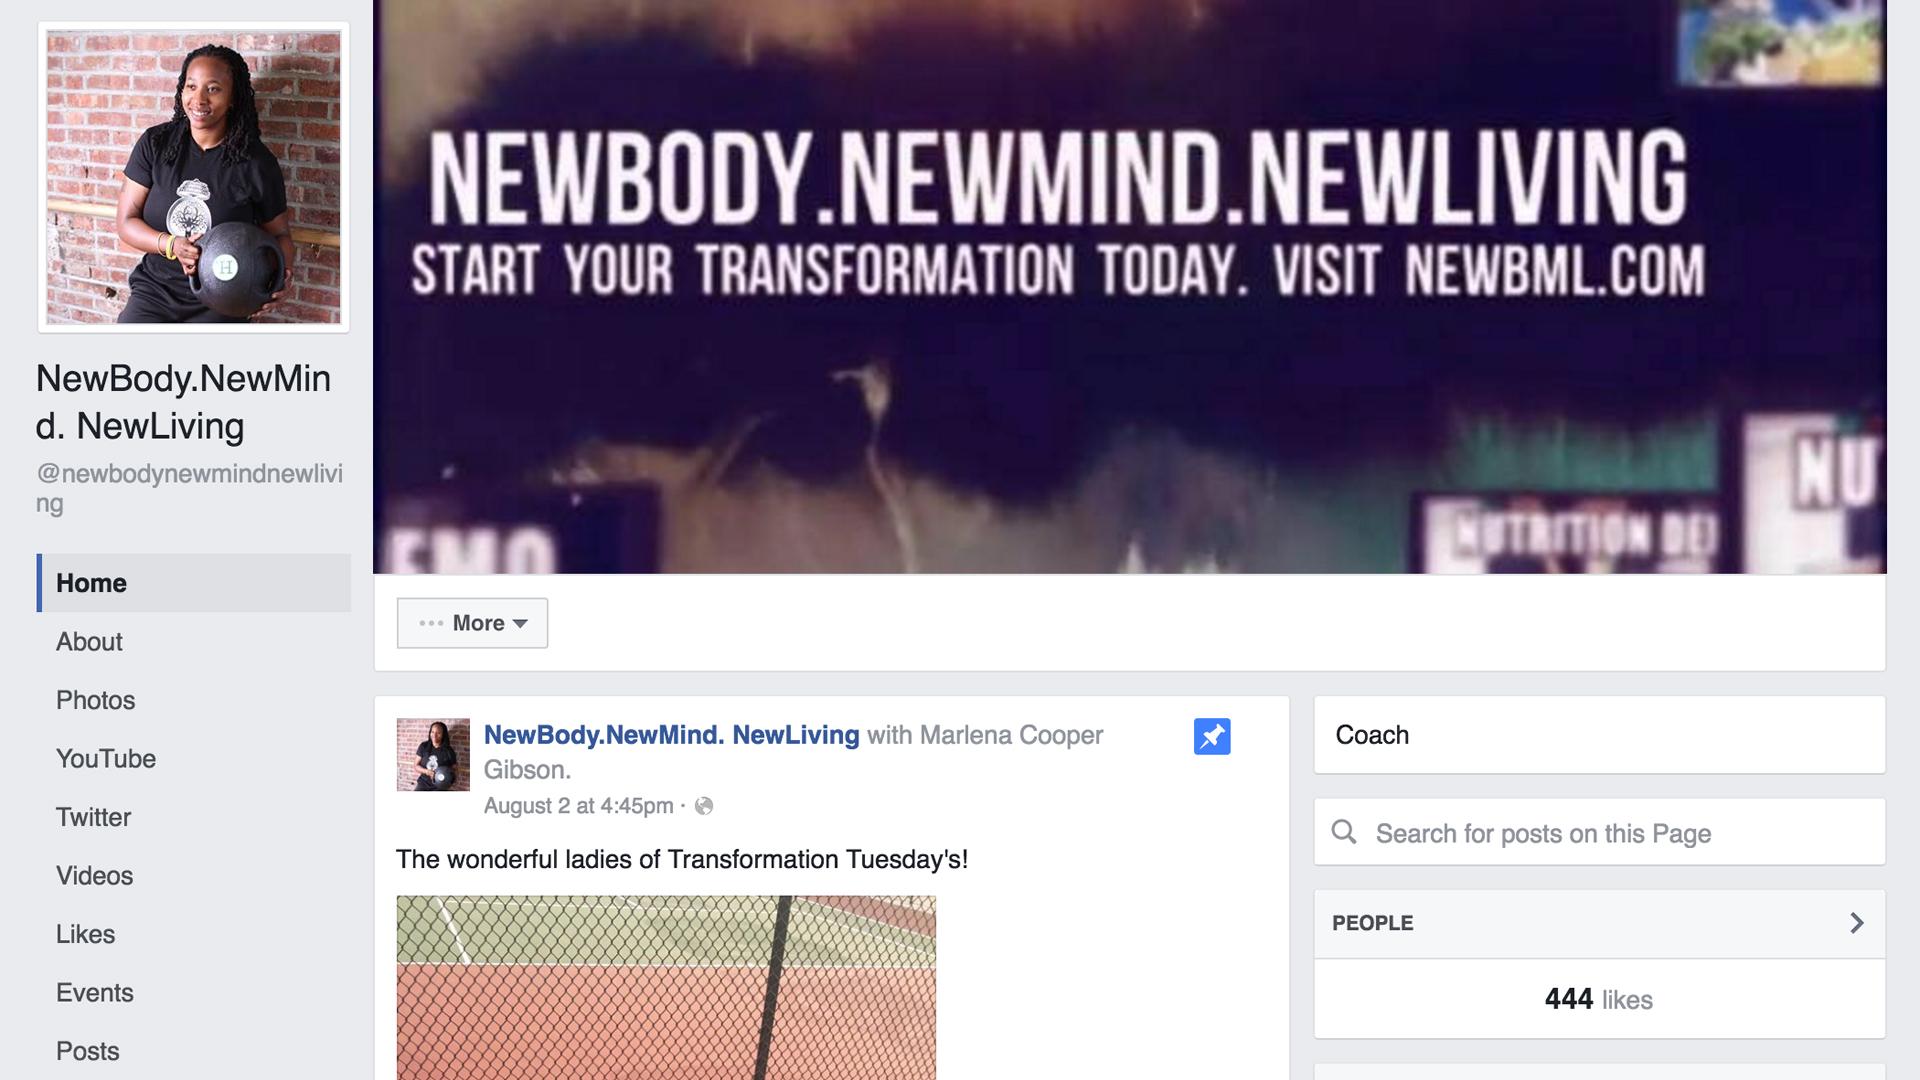 https://www.facebook.com/newbodynewmindnewliving